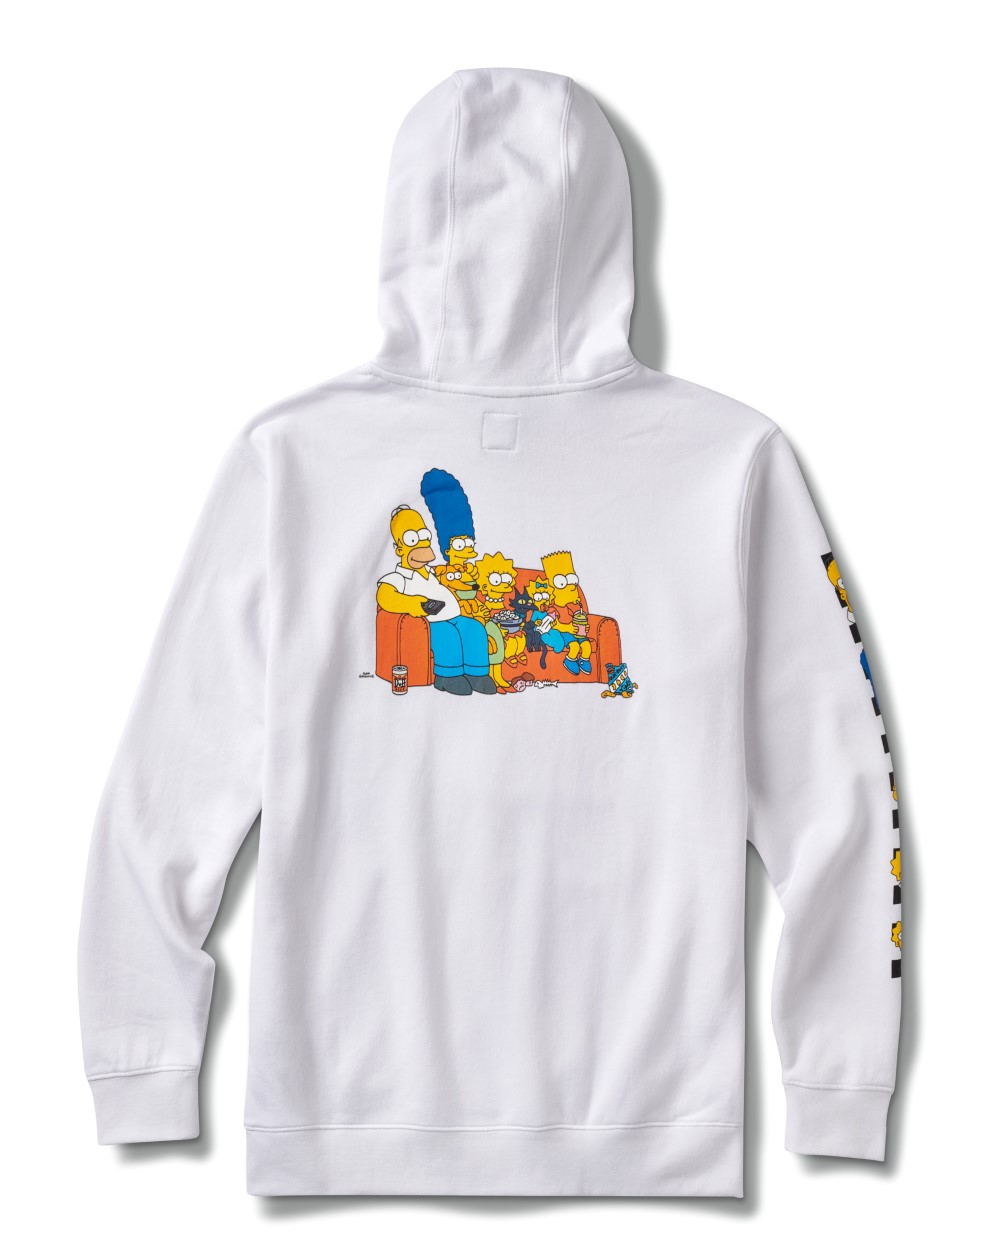 Vans x The Simpsons 11